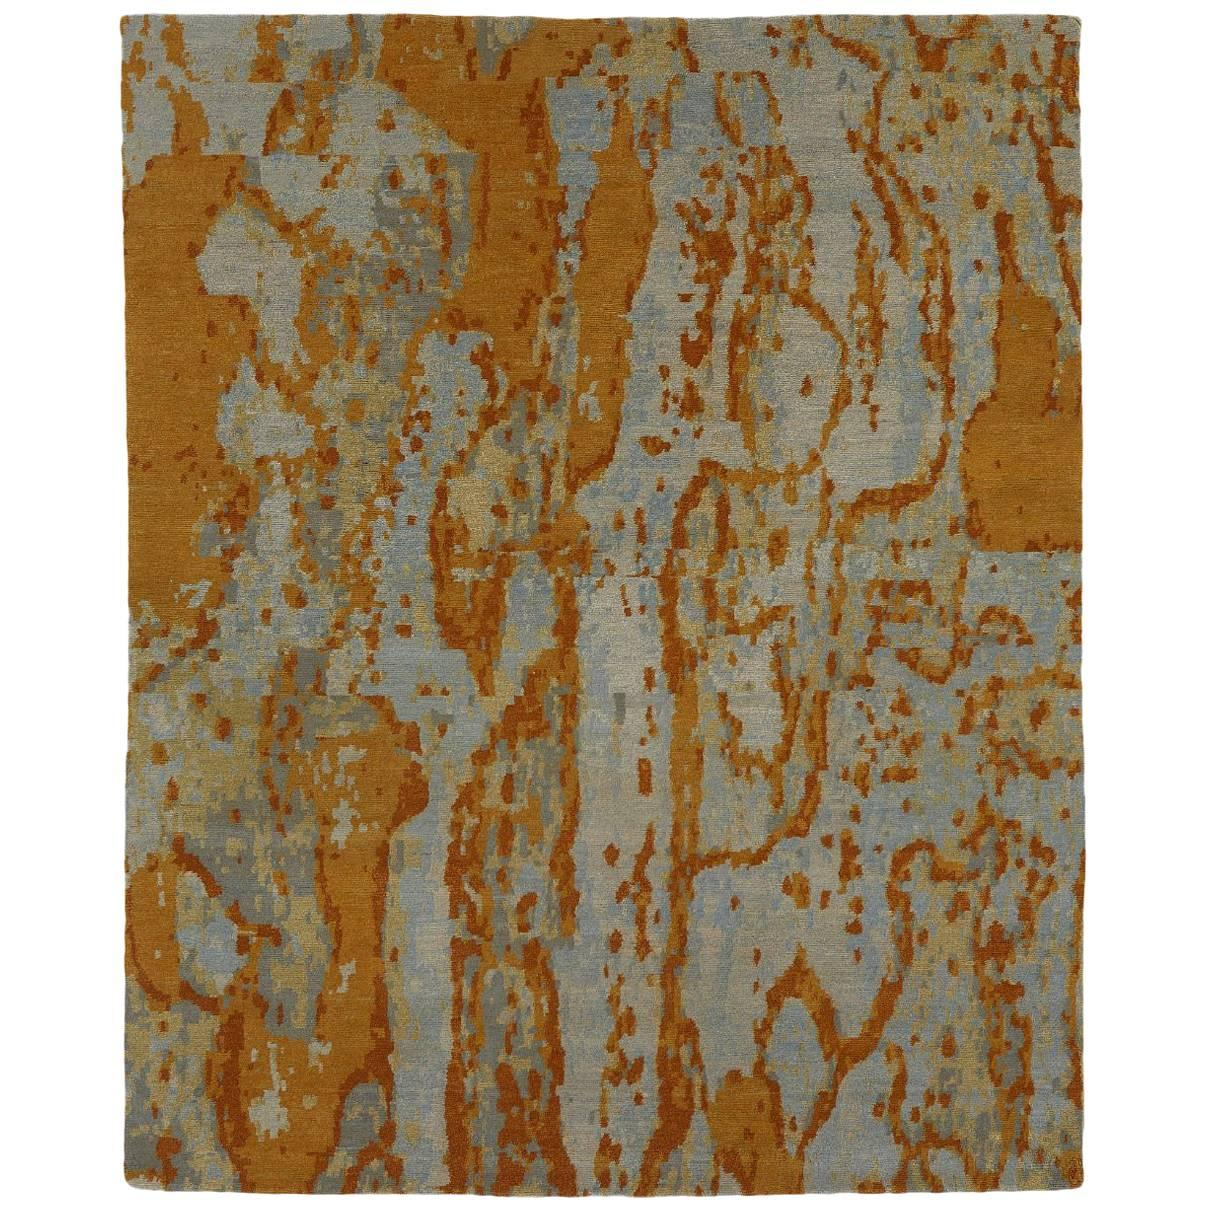 Angela Adams Bark / Aspen Area Rug, 100% New Zealand Wool, Hand-Knotted, Modern